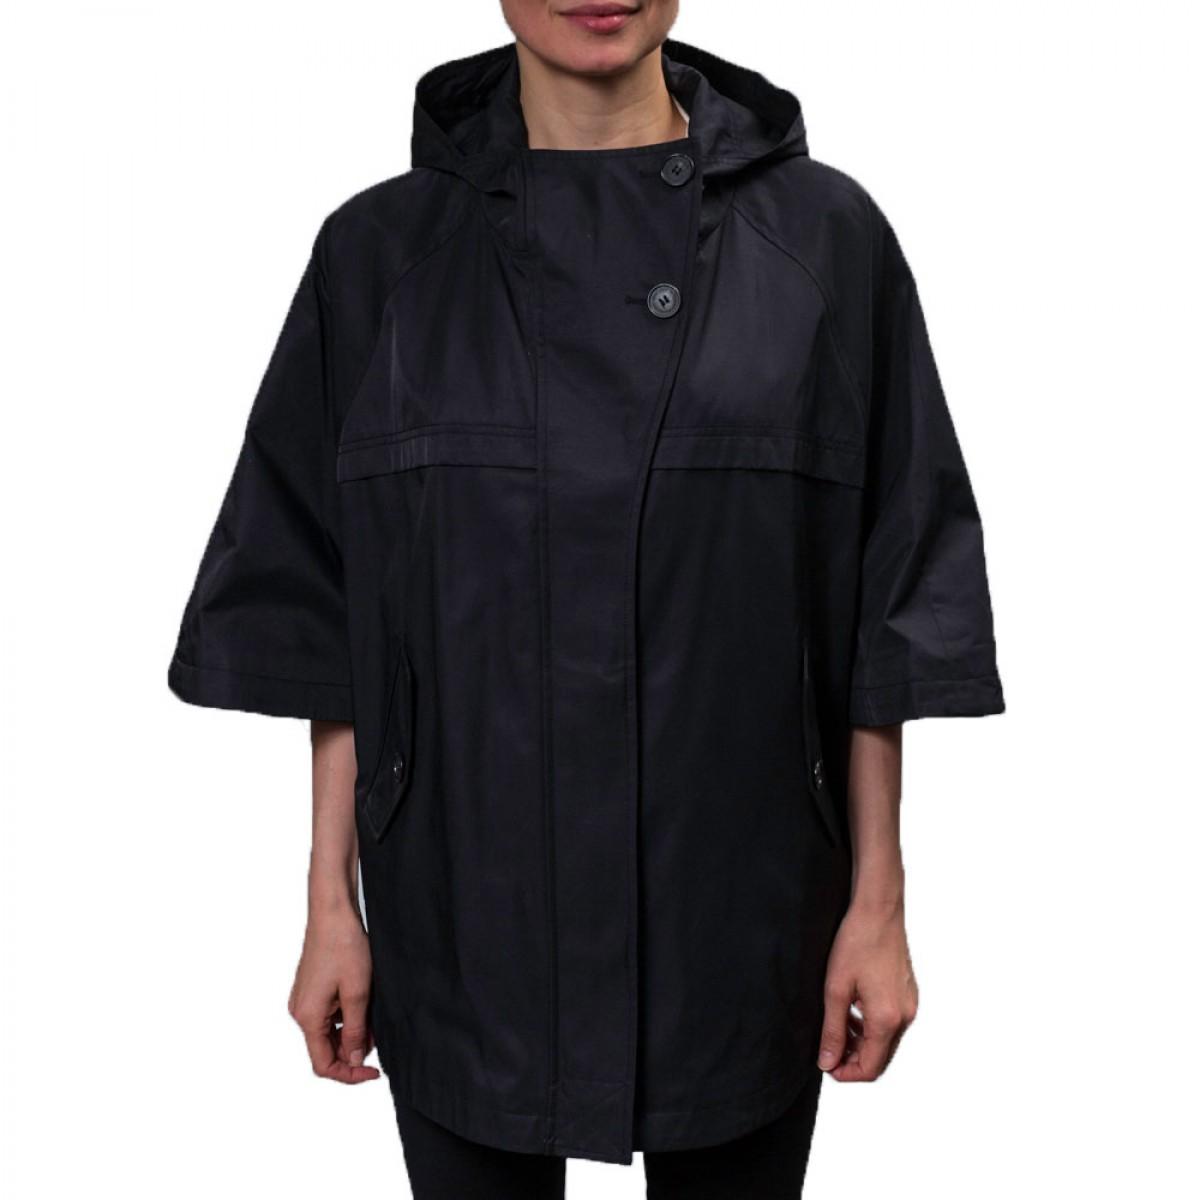 Hilary Radley Women's Hooded Cape